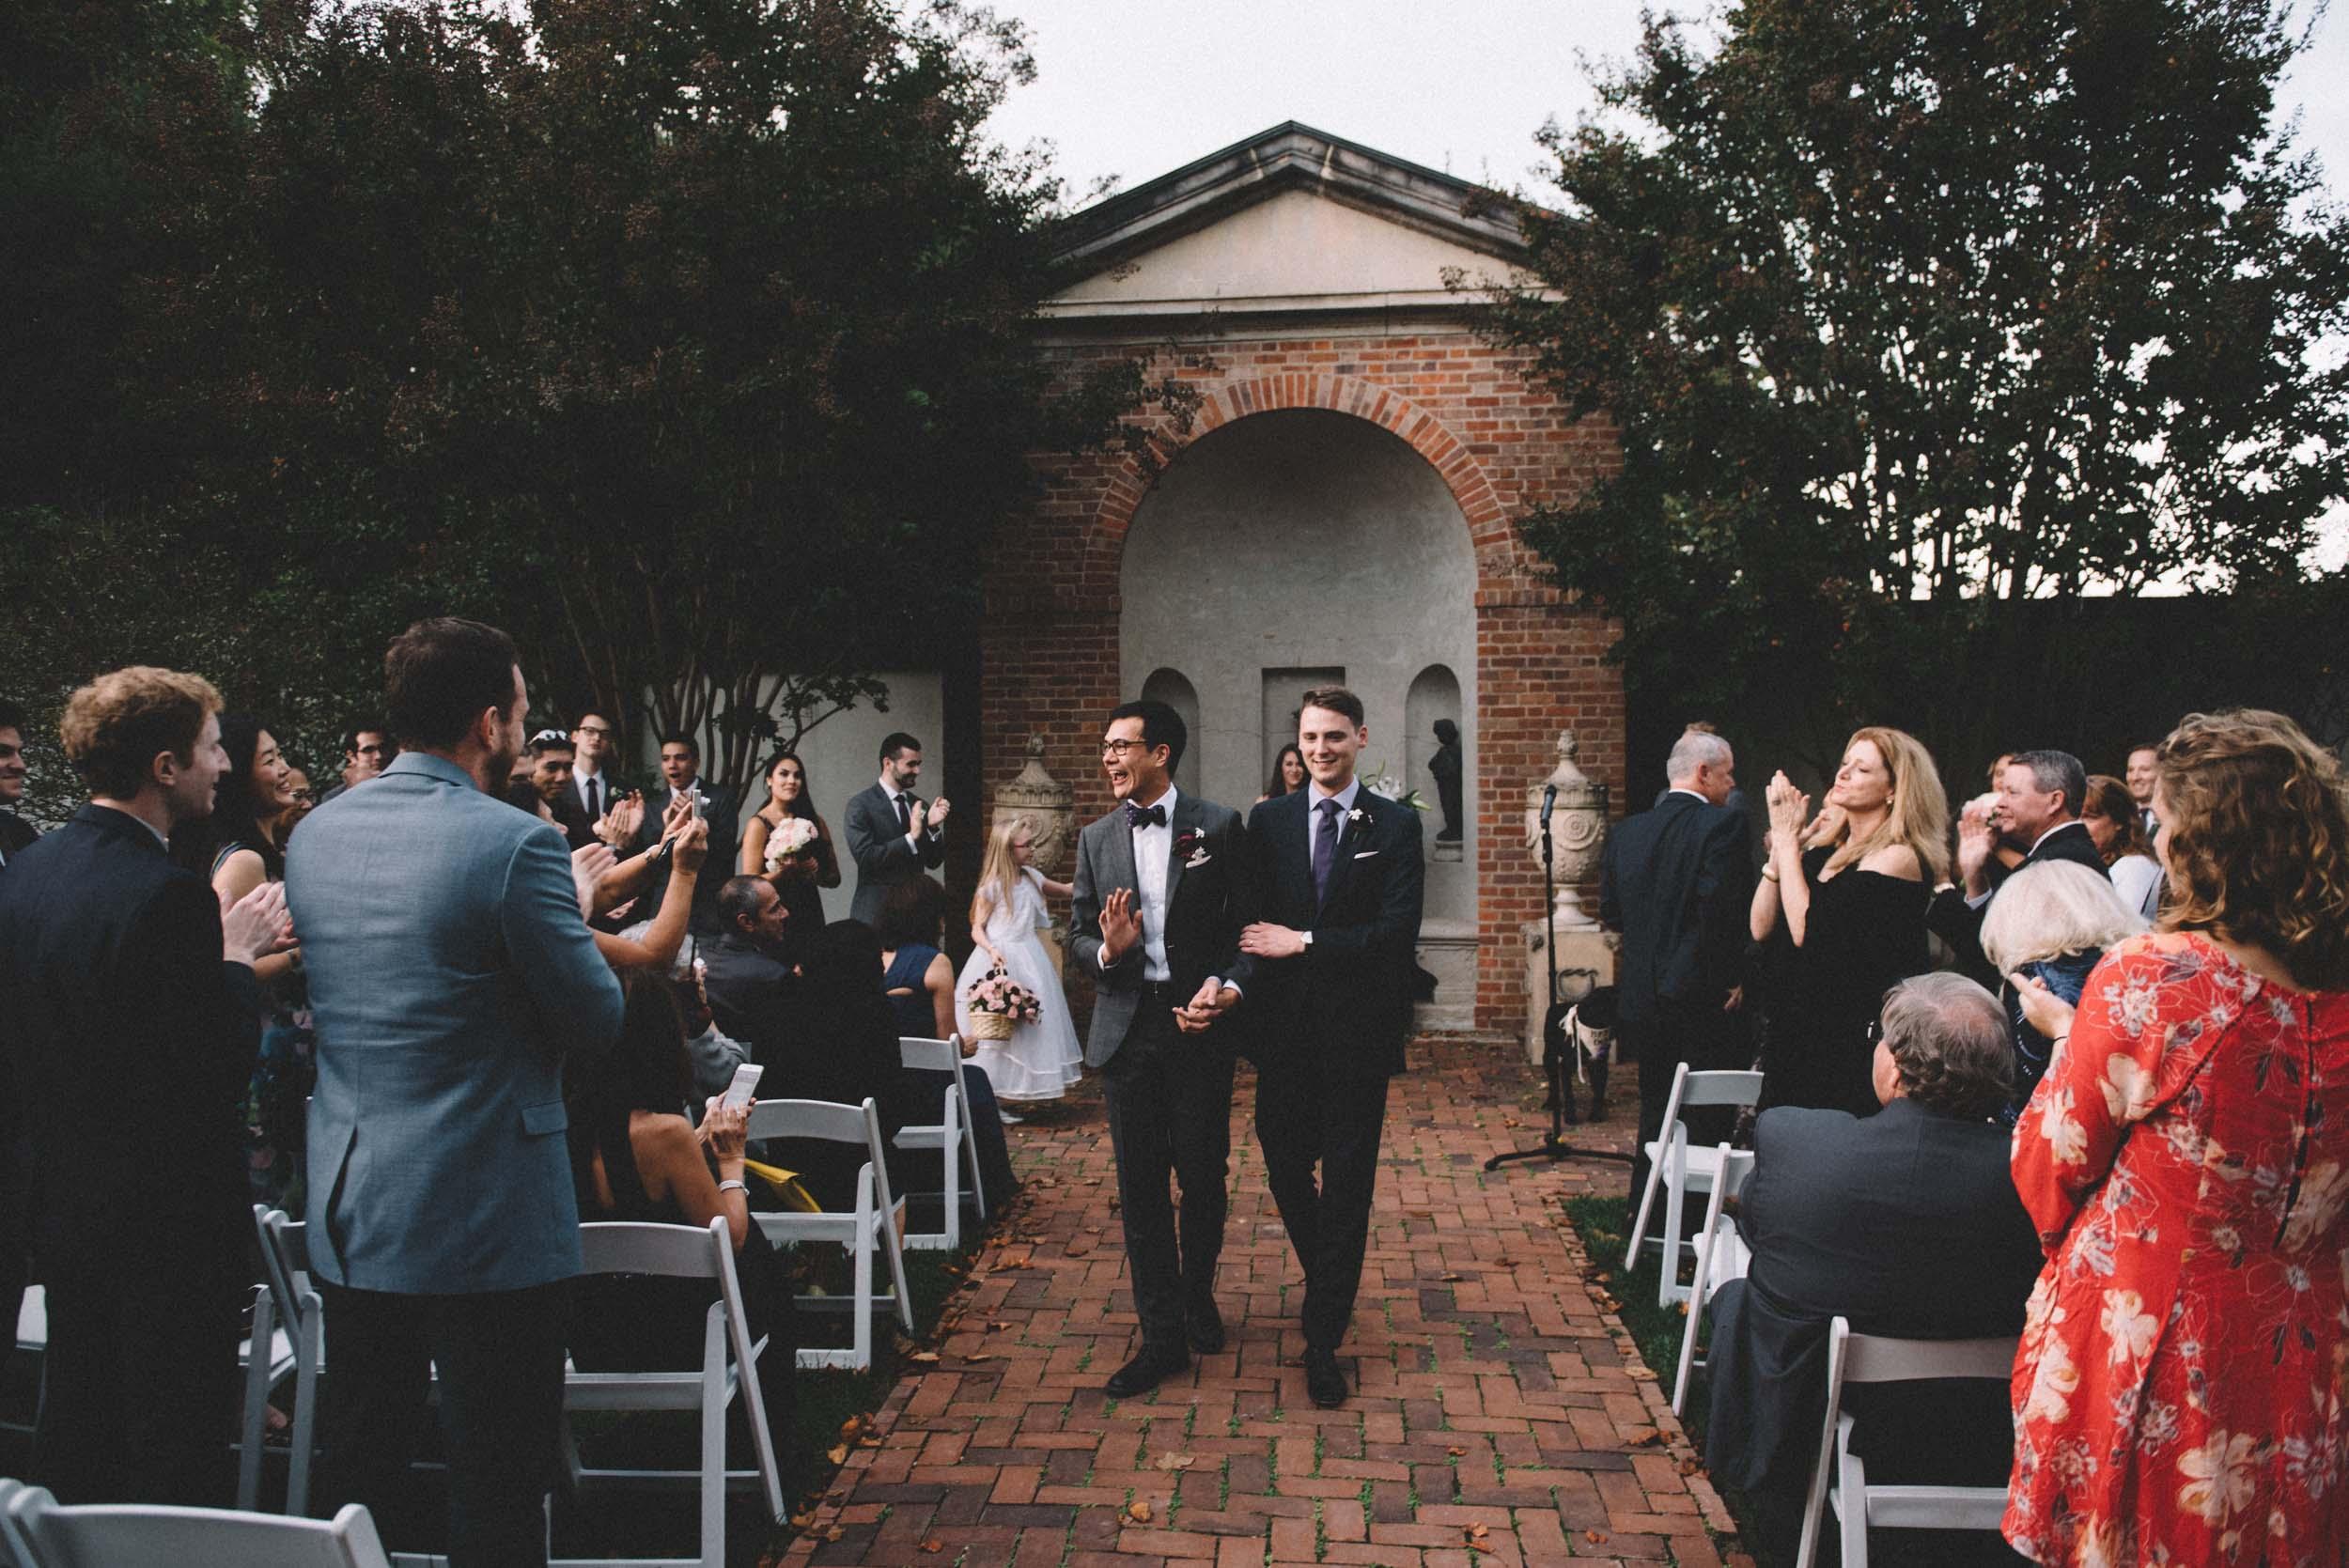 Dumbarton-House-wedding-52.jpg